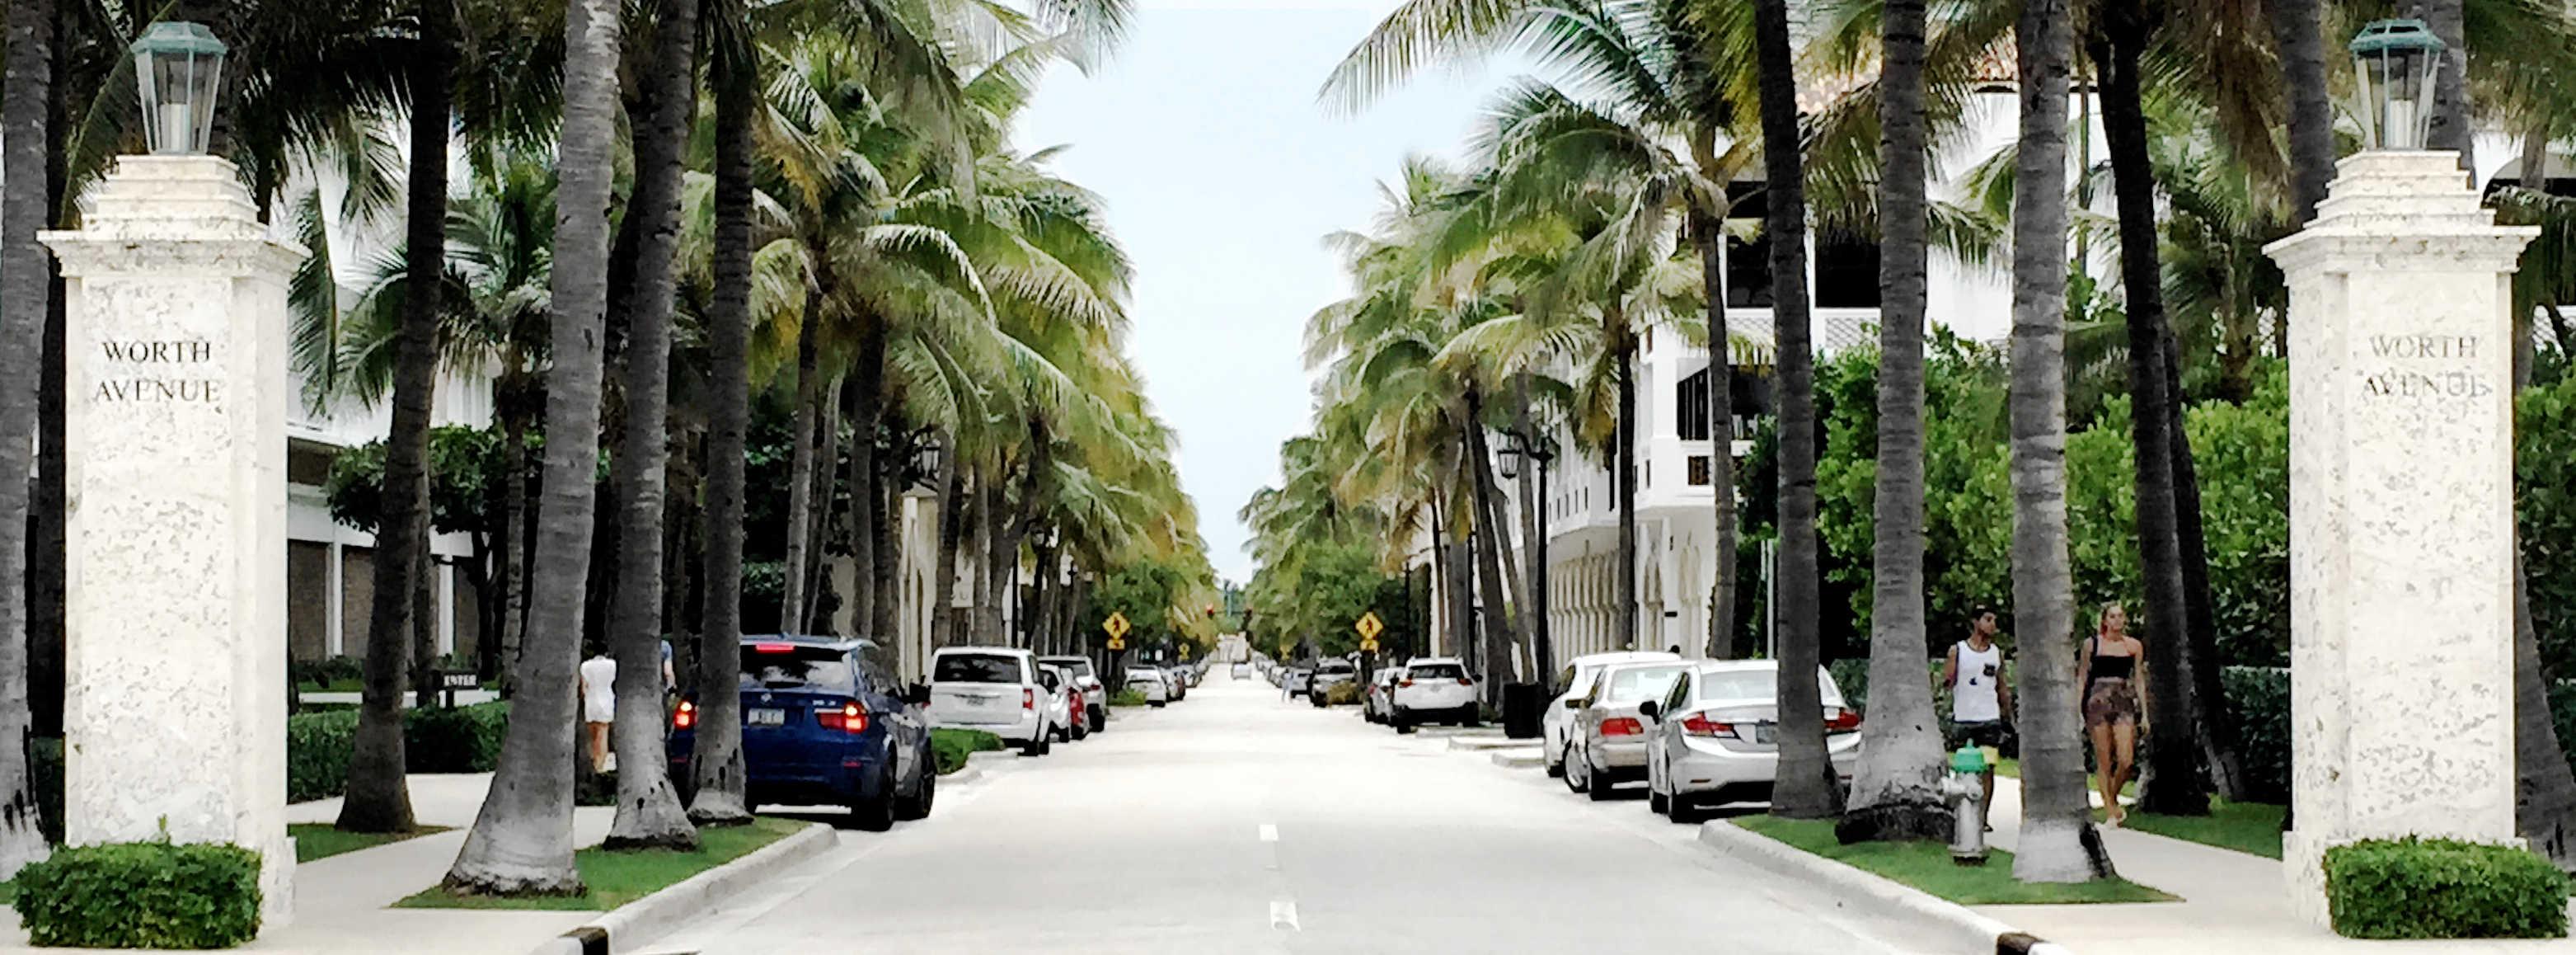 Entrance to Worth Avenue - Palm Beach, Florida